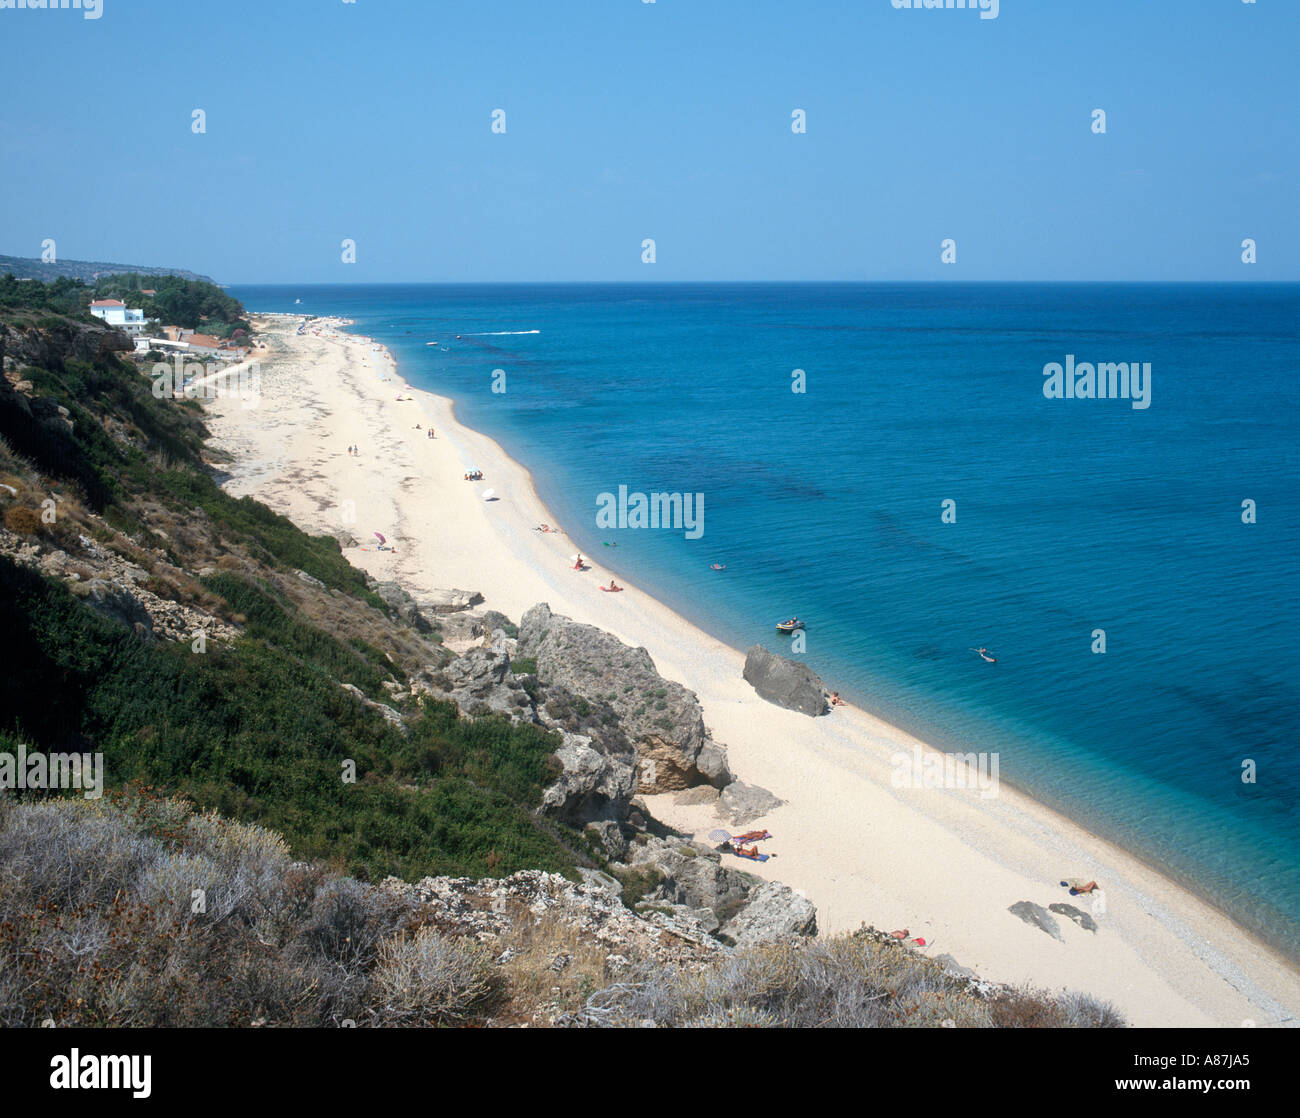 Hilltop view over Skala beach, Kefalonia, Ionian Islands, Greece - Stock Image